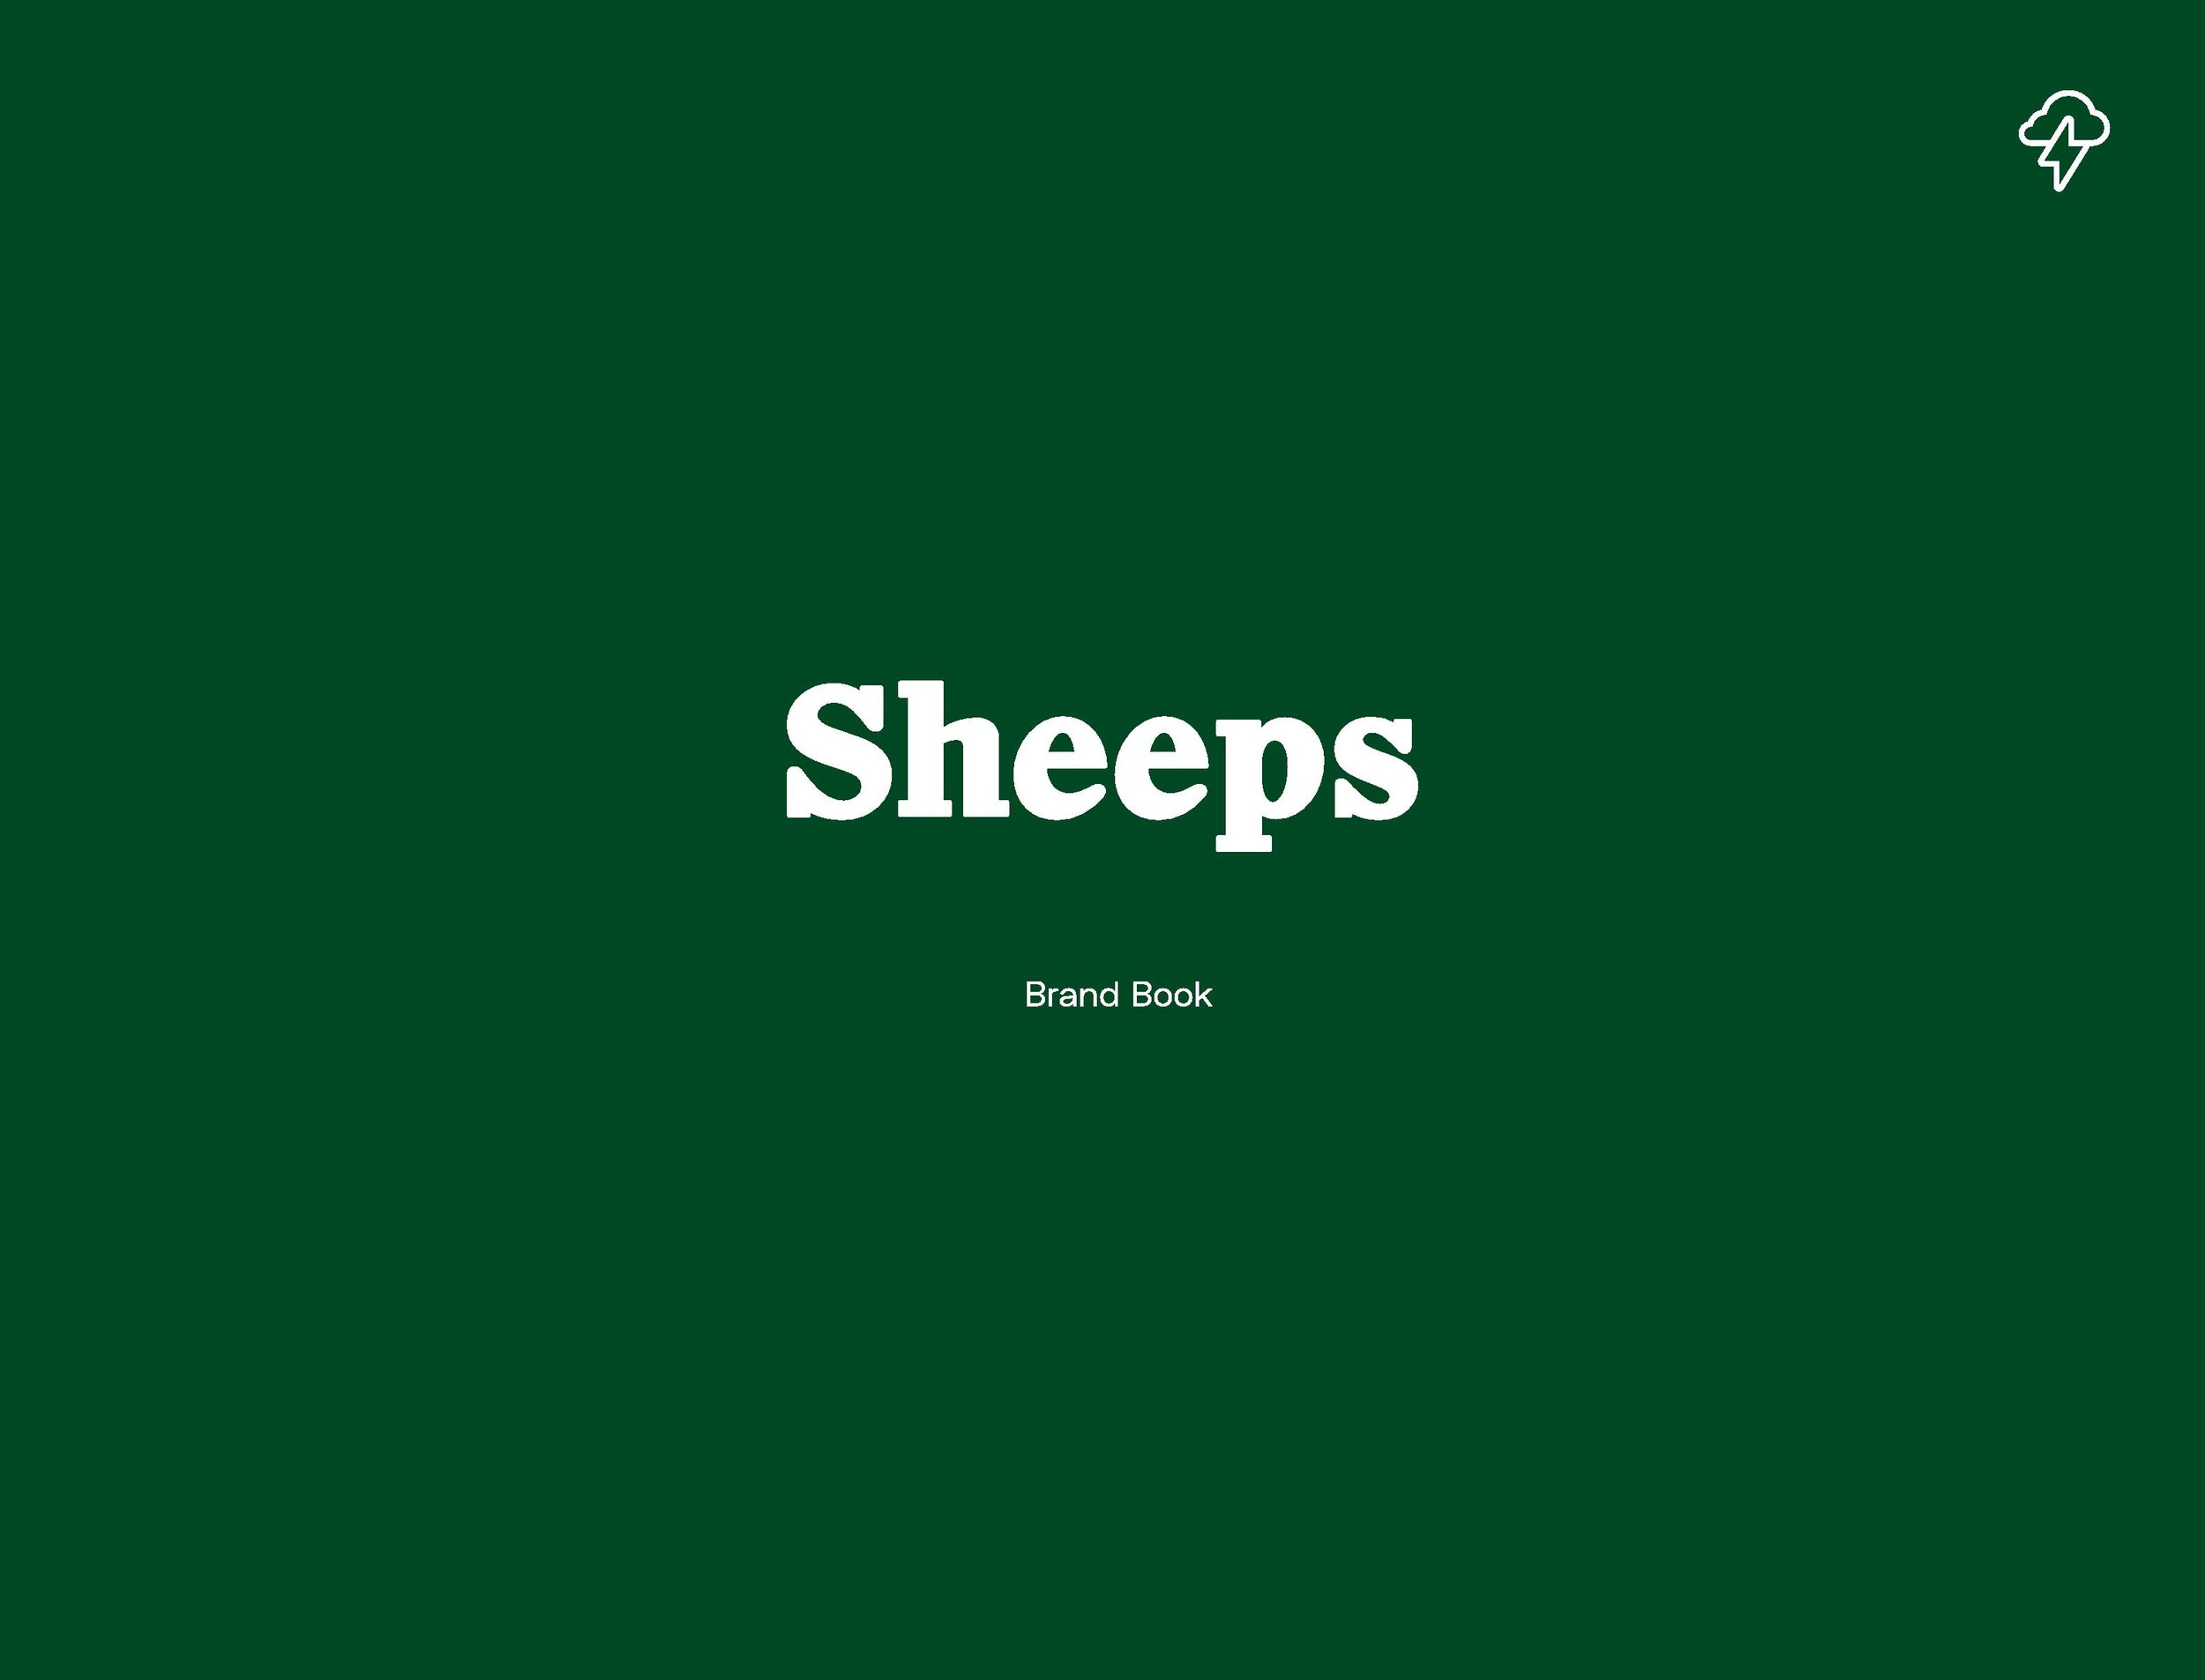 Sheeps Brand Guide-page-001.jpg